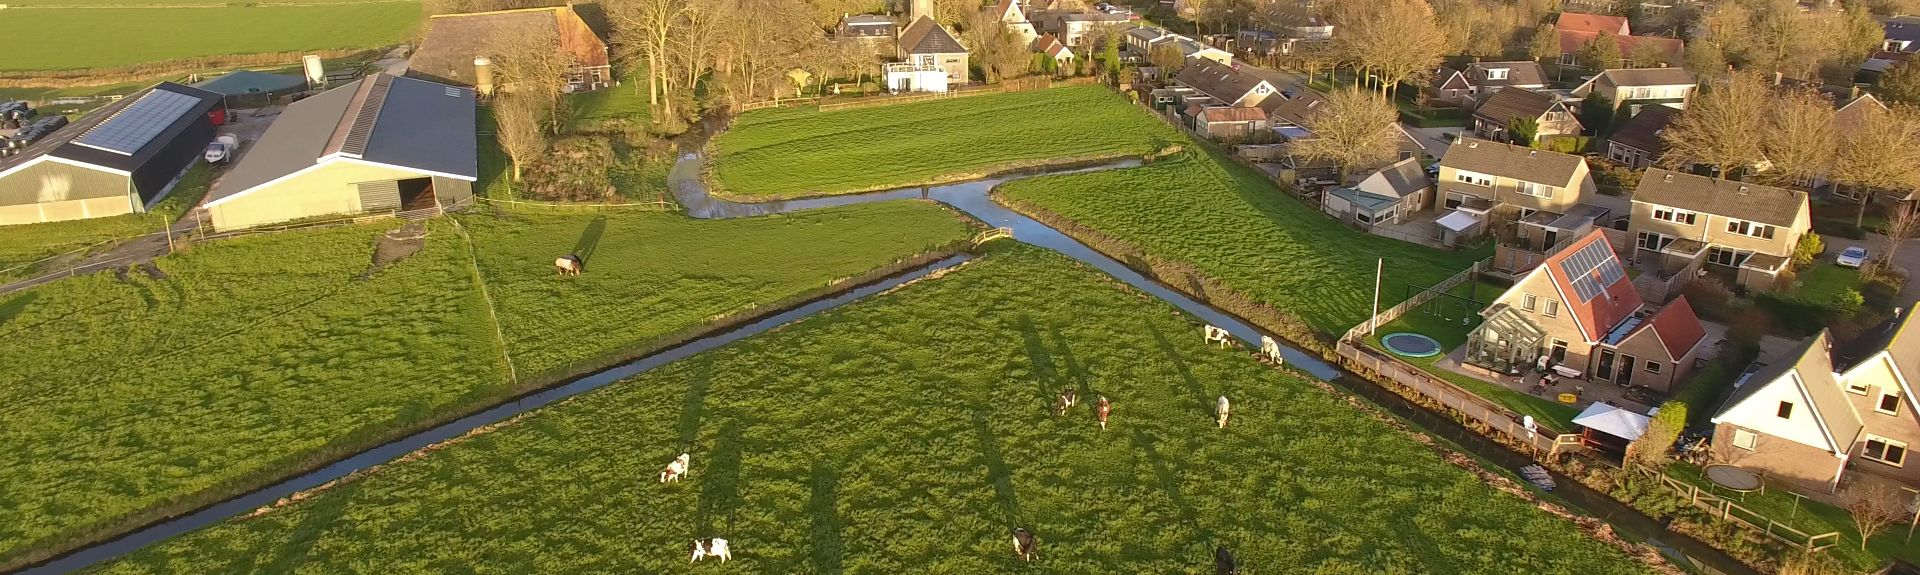 Earnewâld, Friesland, Niederlande